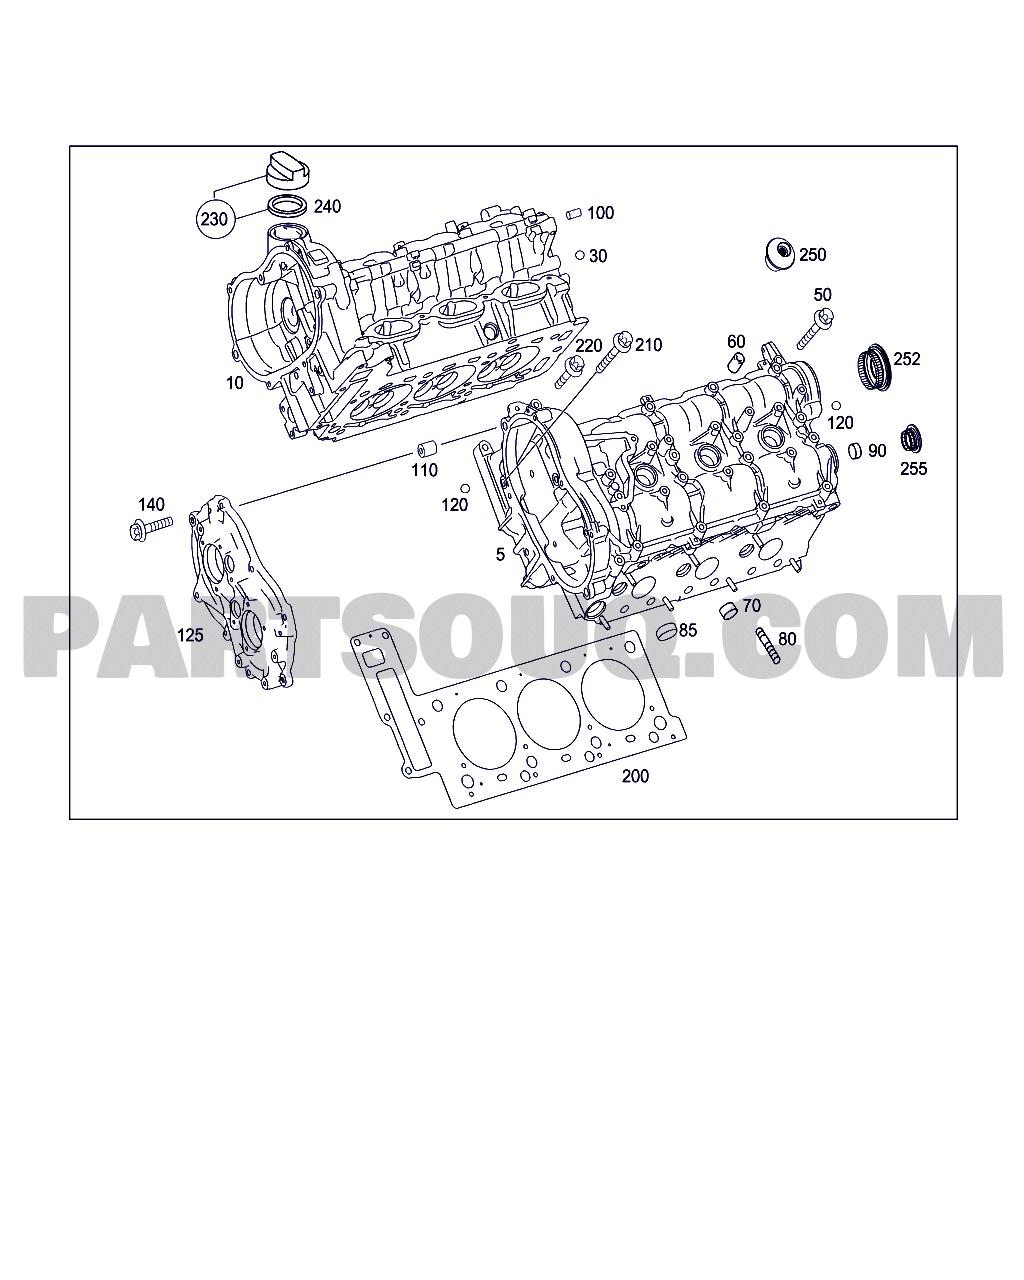 Mercedes Benz Parts Catalog >> Cylinder Head Gasket Kit Clk 350 Wdb2094562t064609 01 11 2005